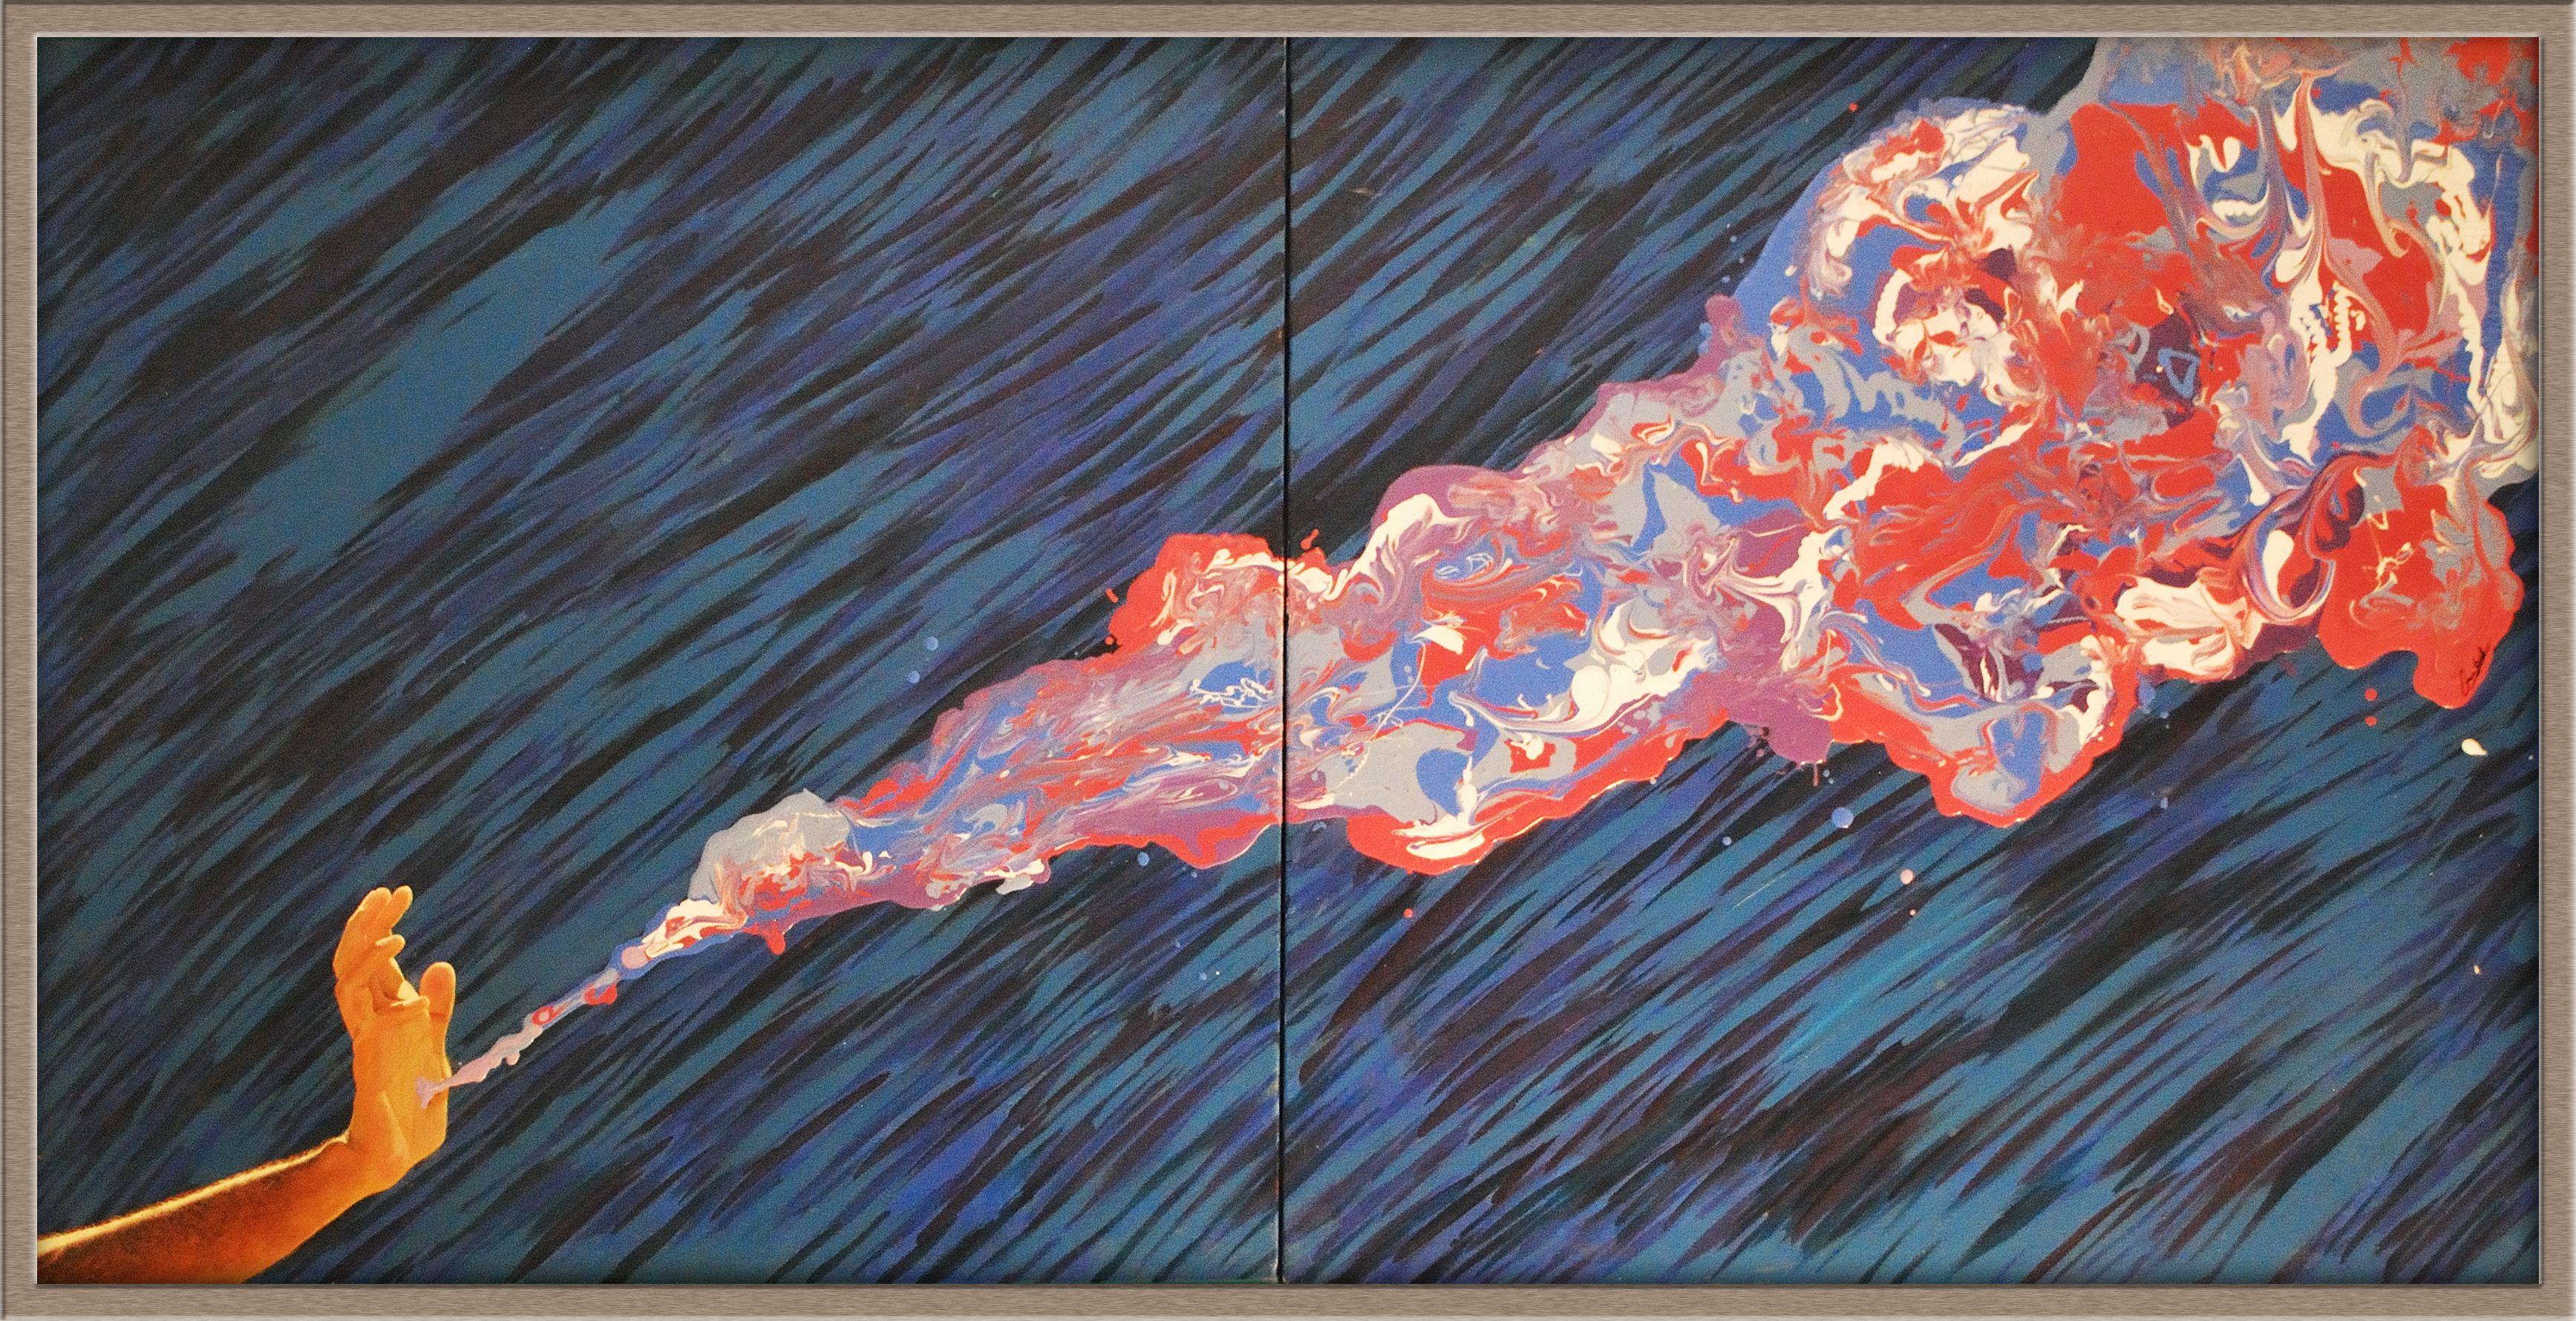 "Splash of Action  36"" x 72""  Acrylic on canvas"